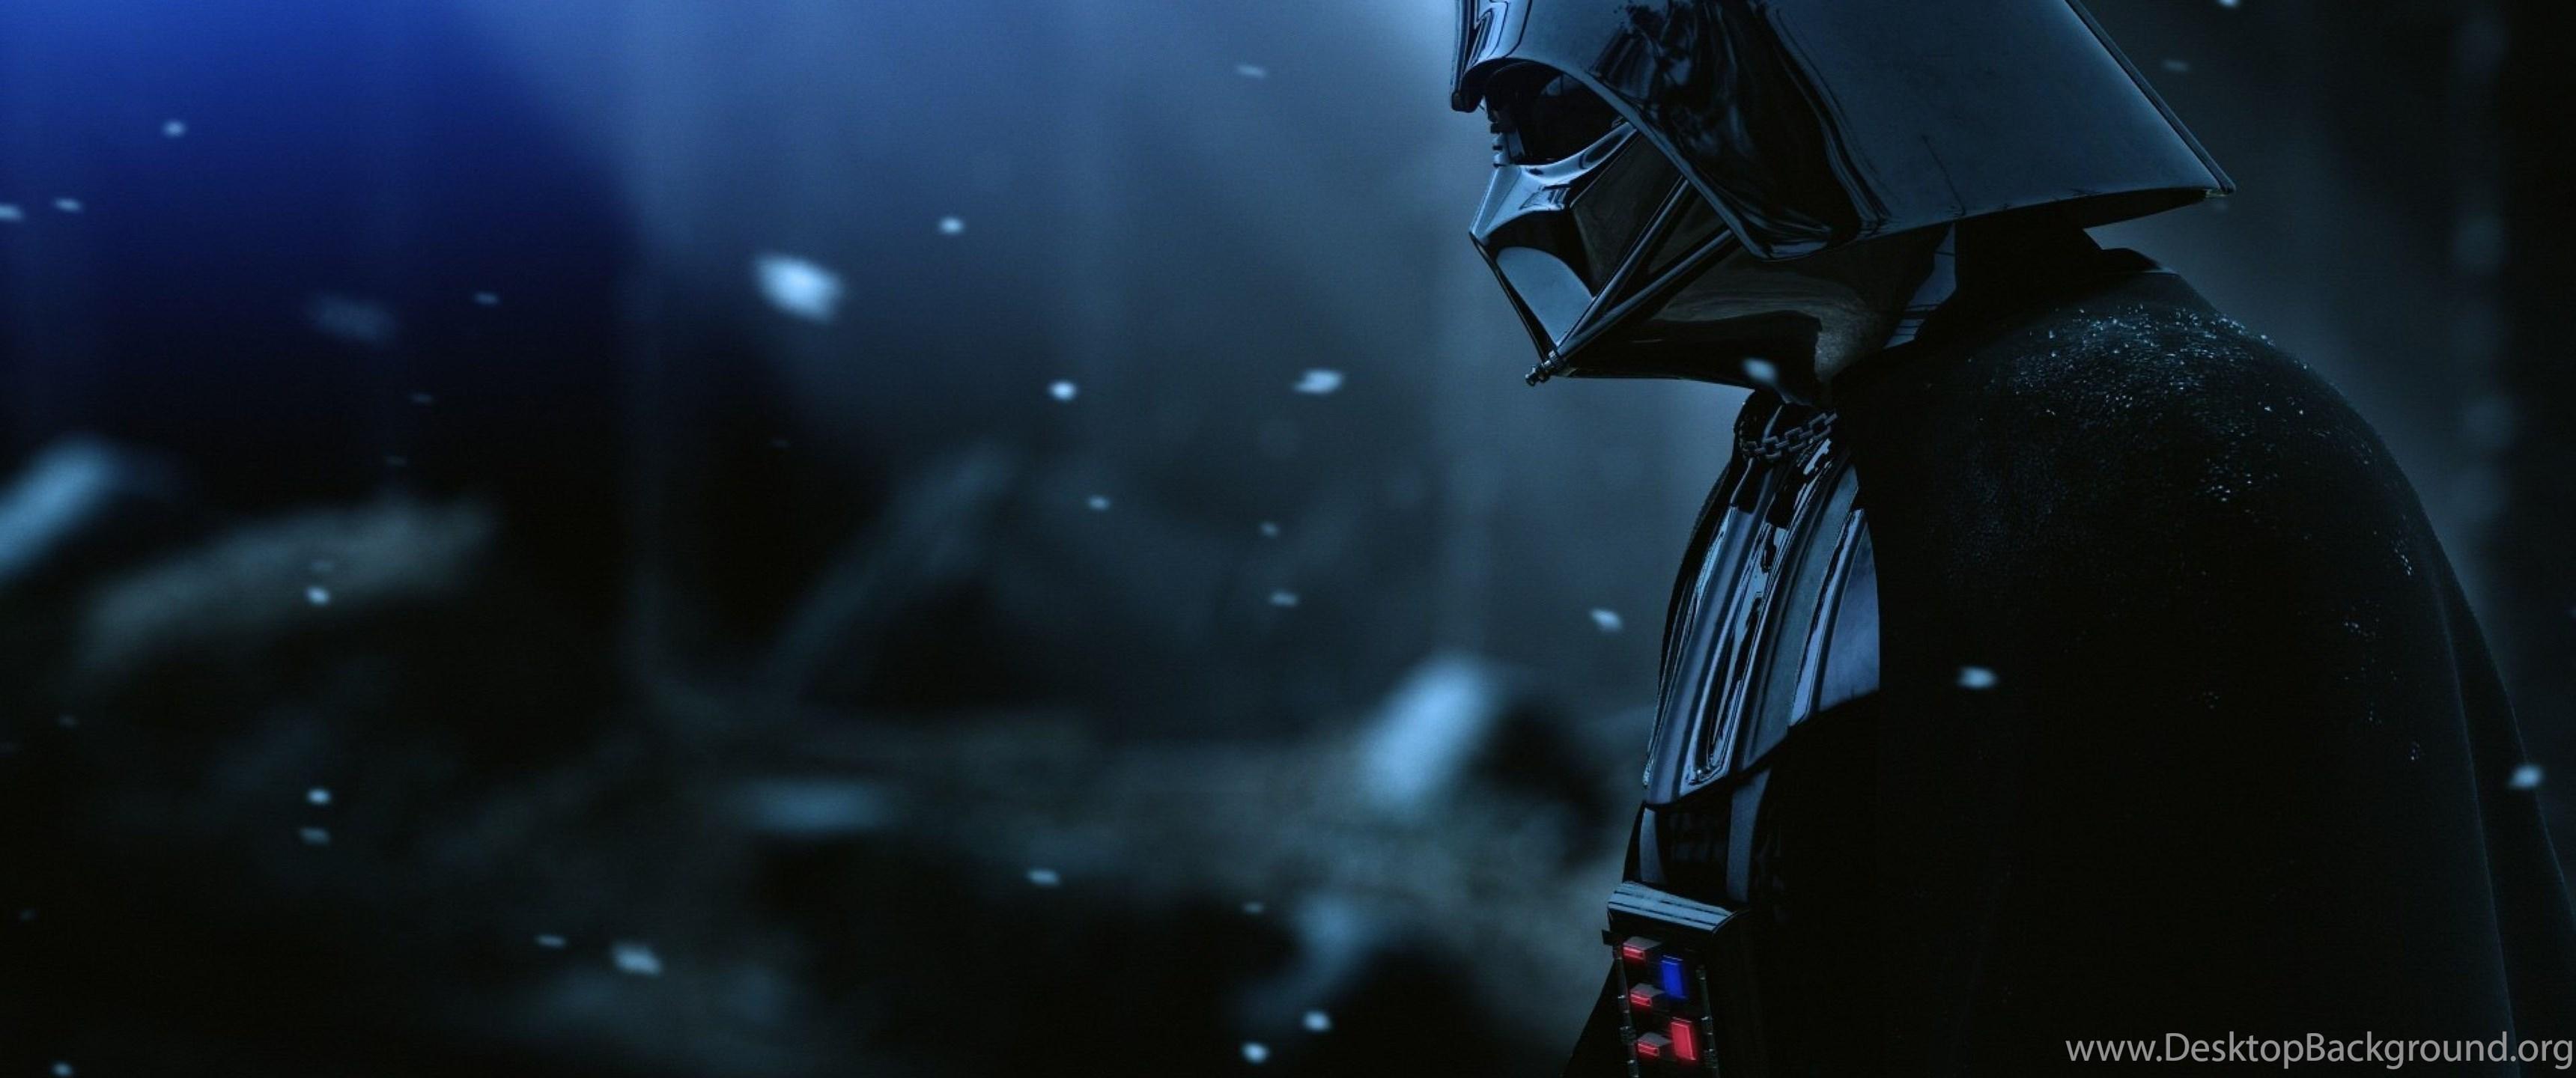 3440x1440 Wallpaper Star Wars: Download Wallpapers 3840x2160 Darth Vader, Armor, Star